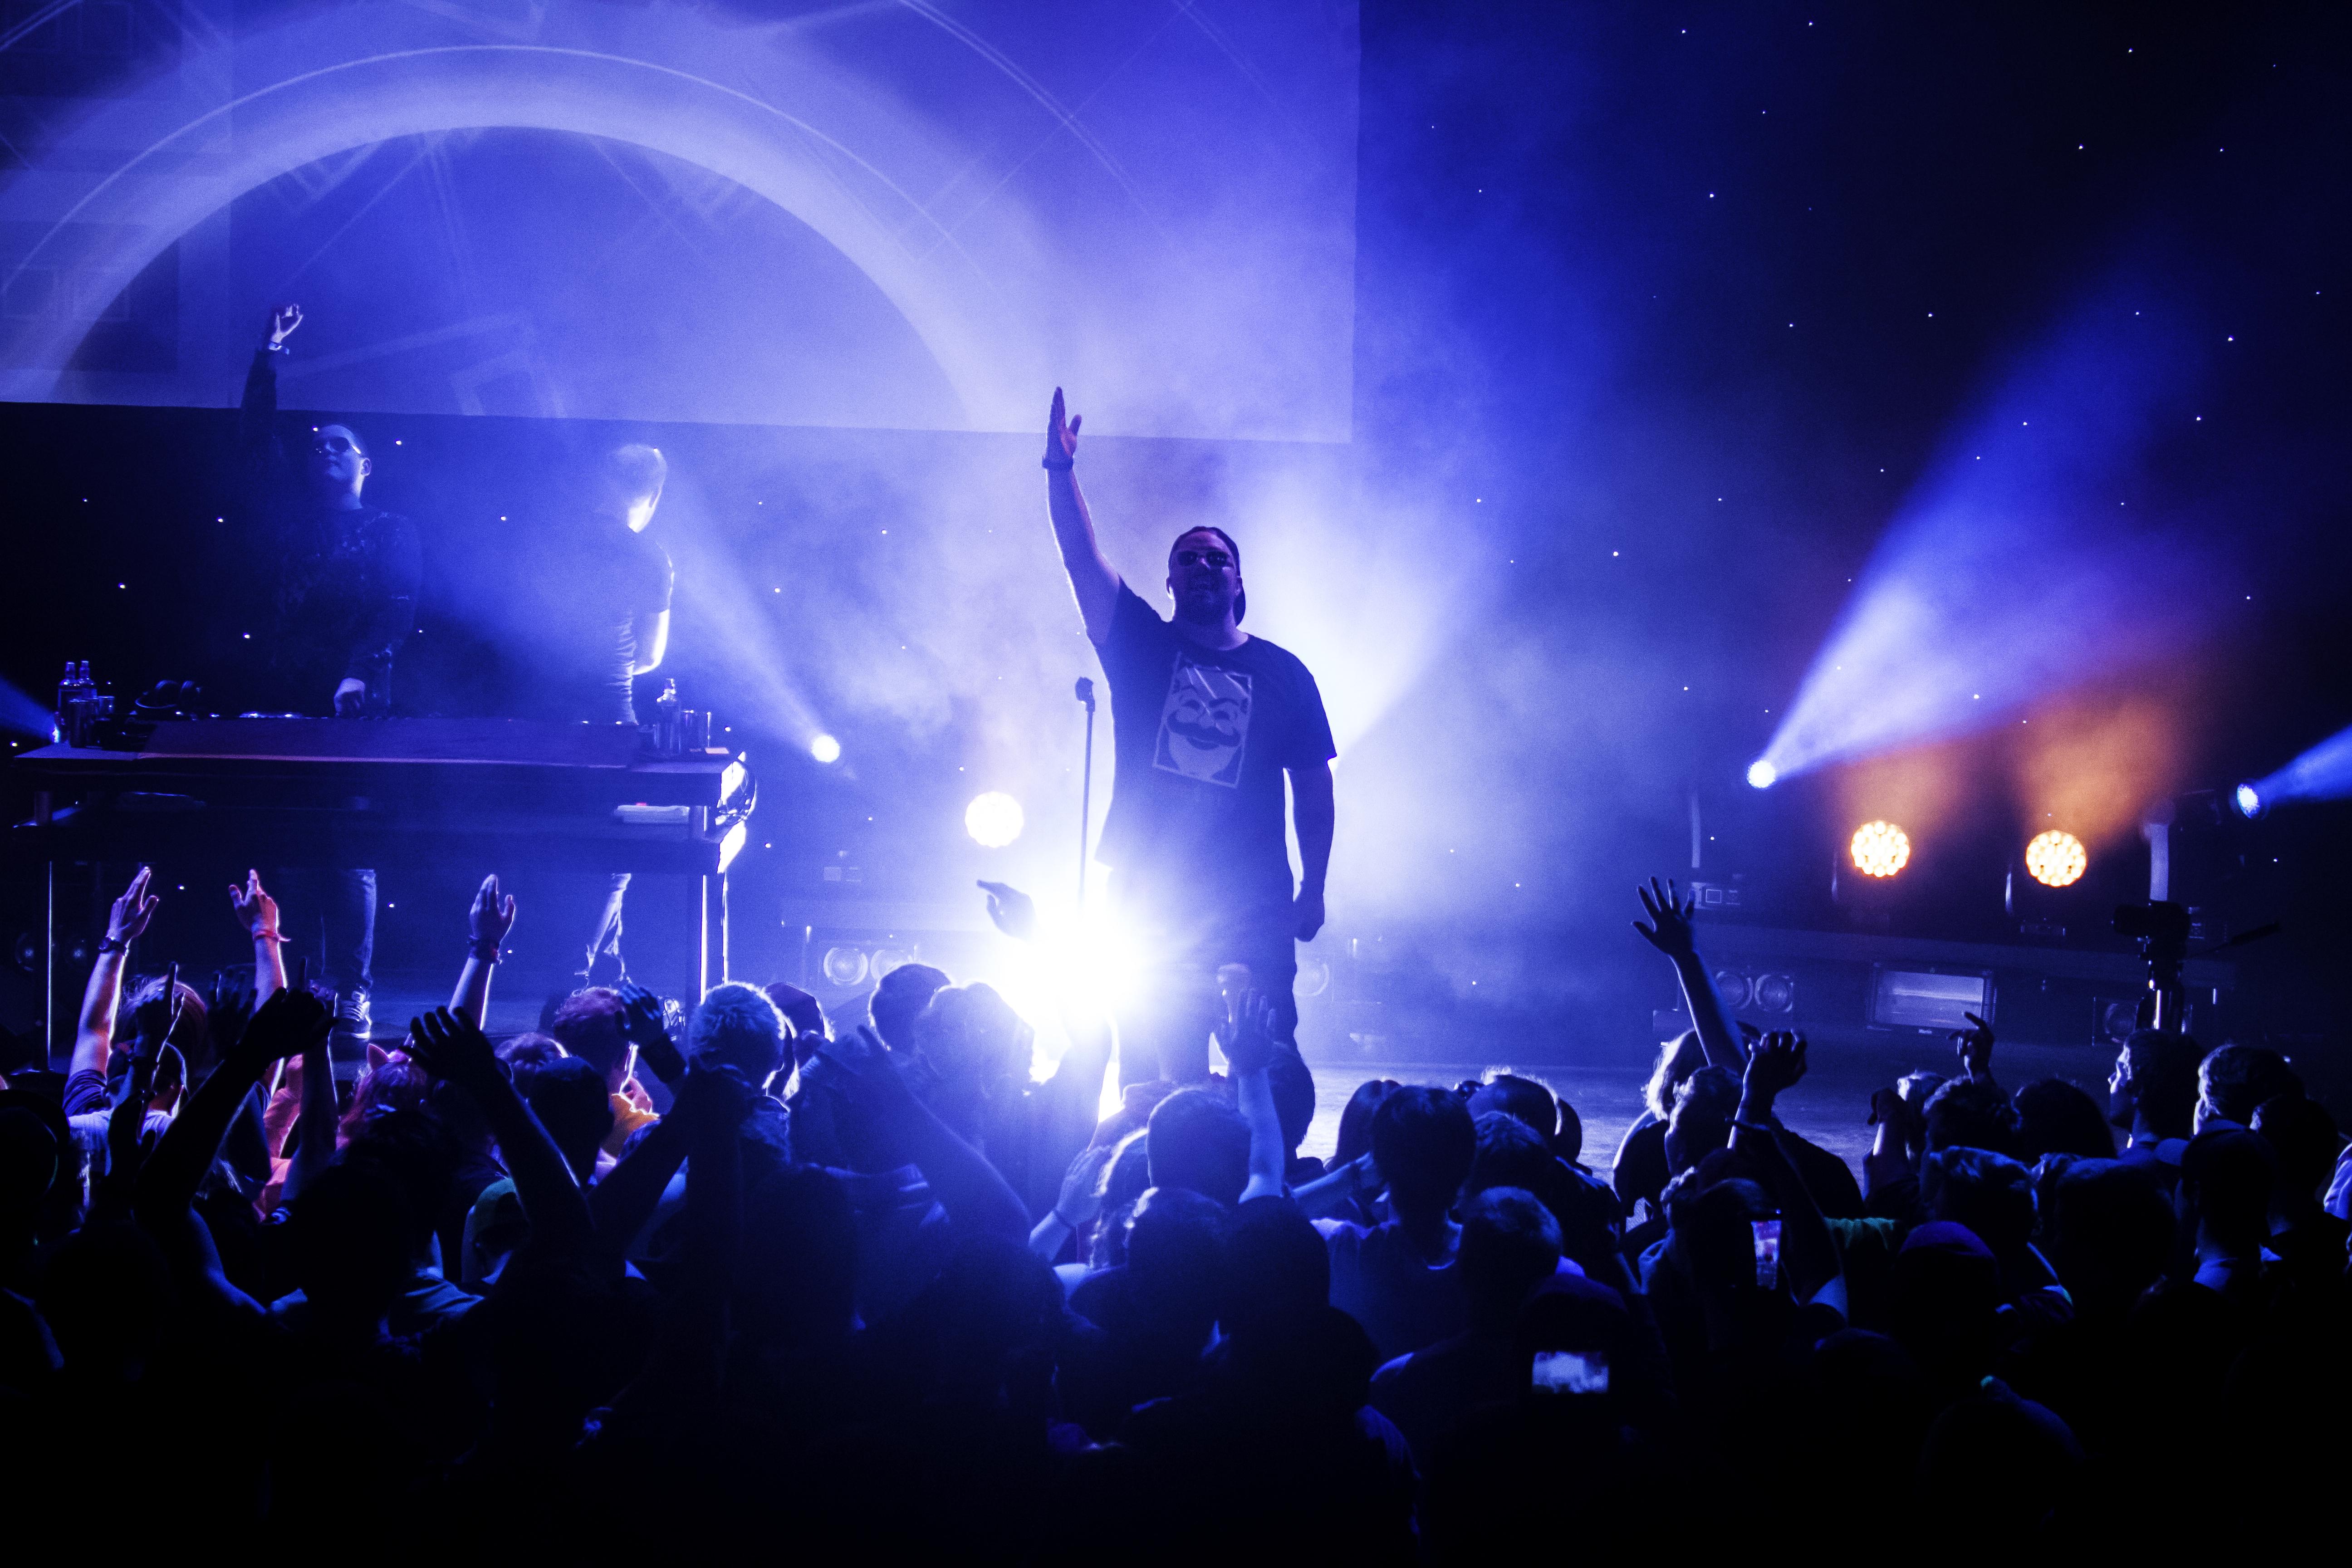 Konsert på TG 2017. Foto: Kari-Elise A. Eikelia